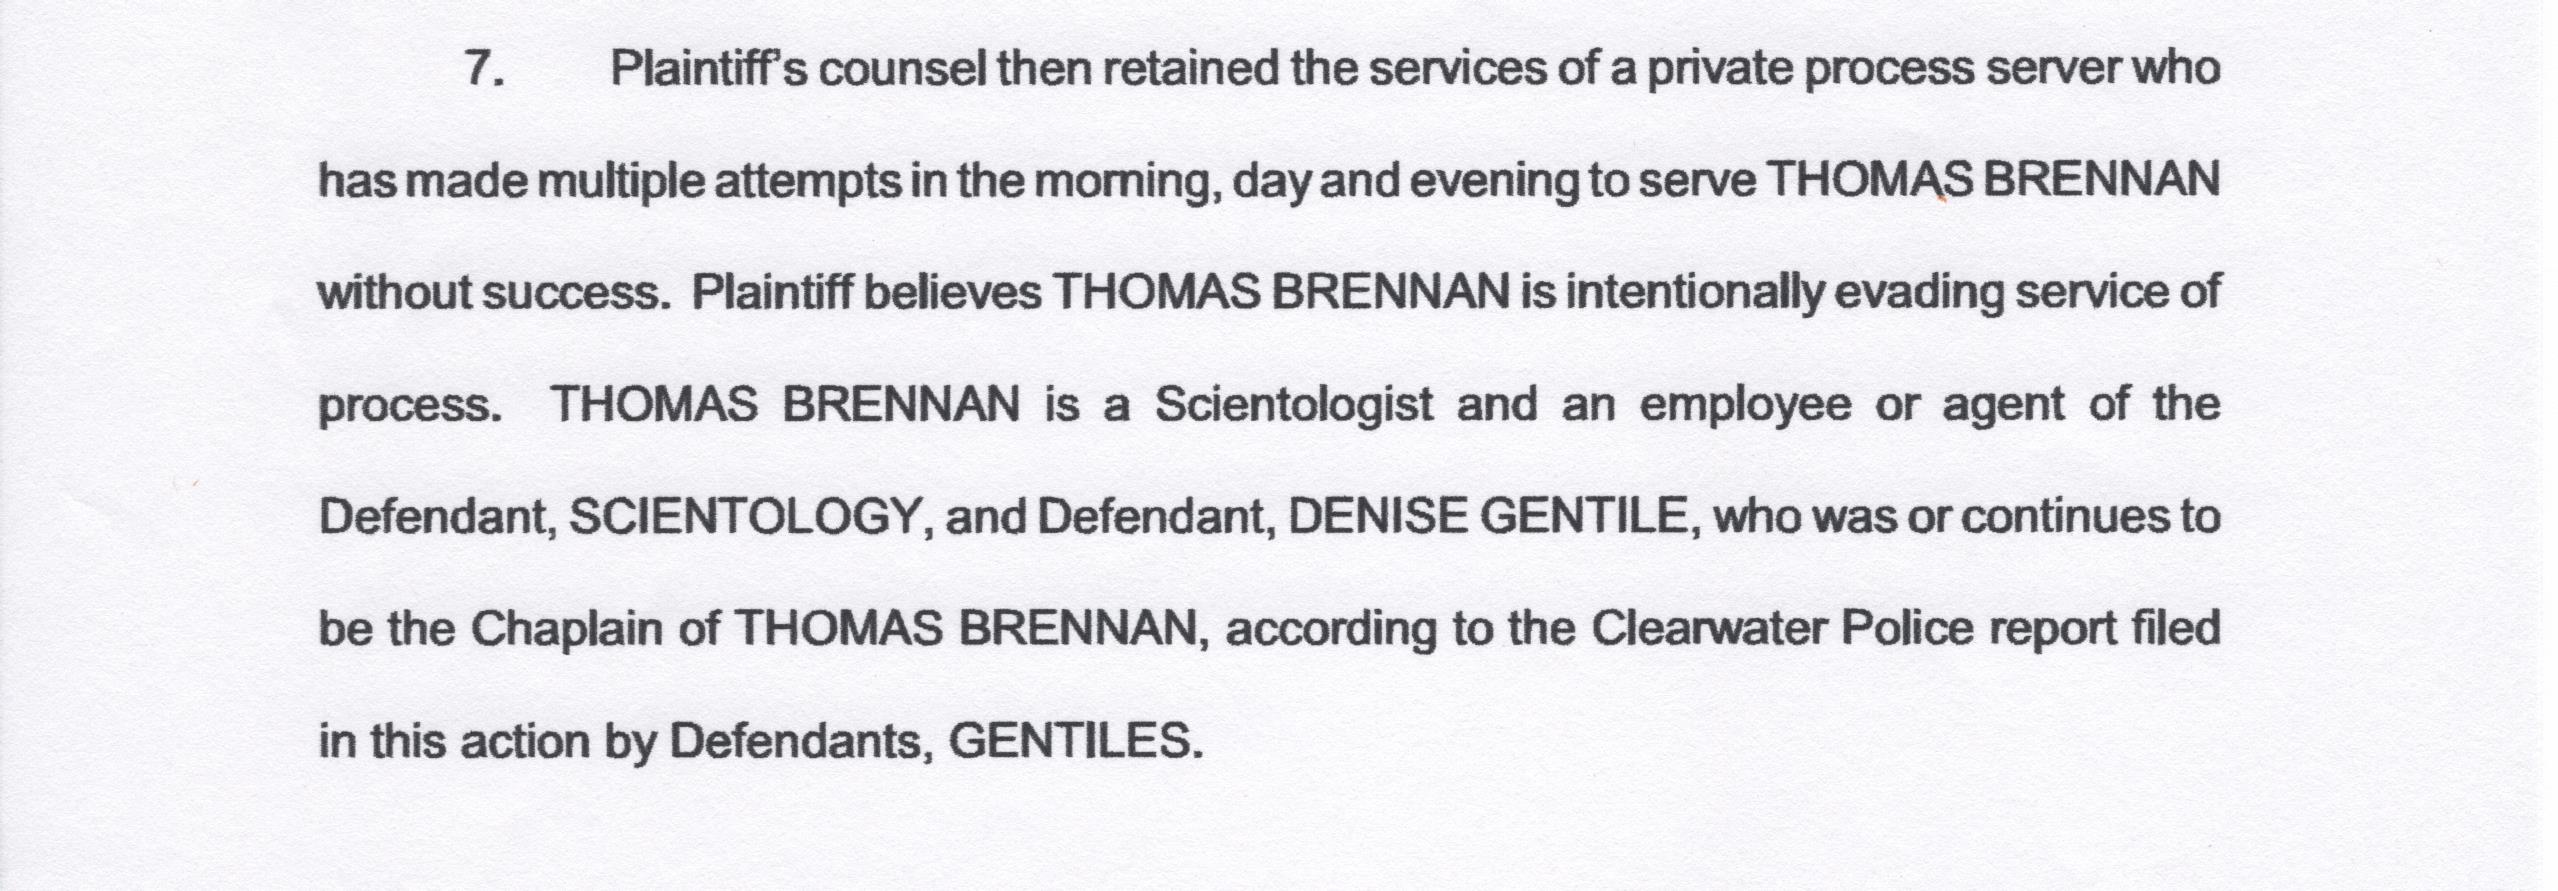 Evading the server, Tom Brennan 001